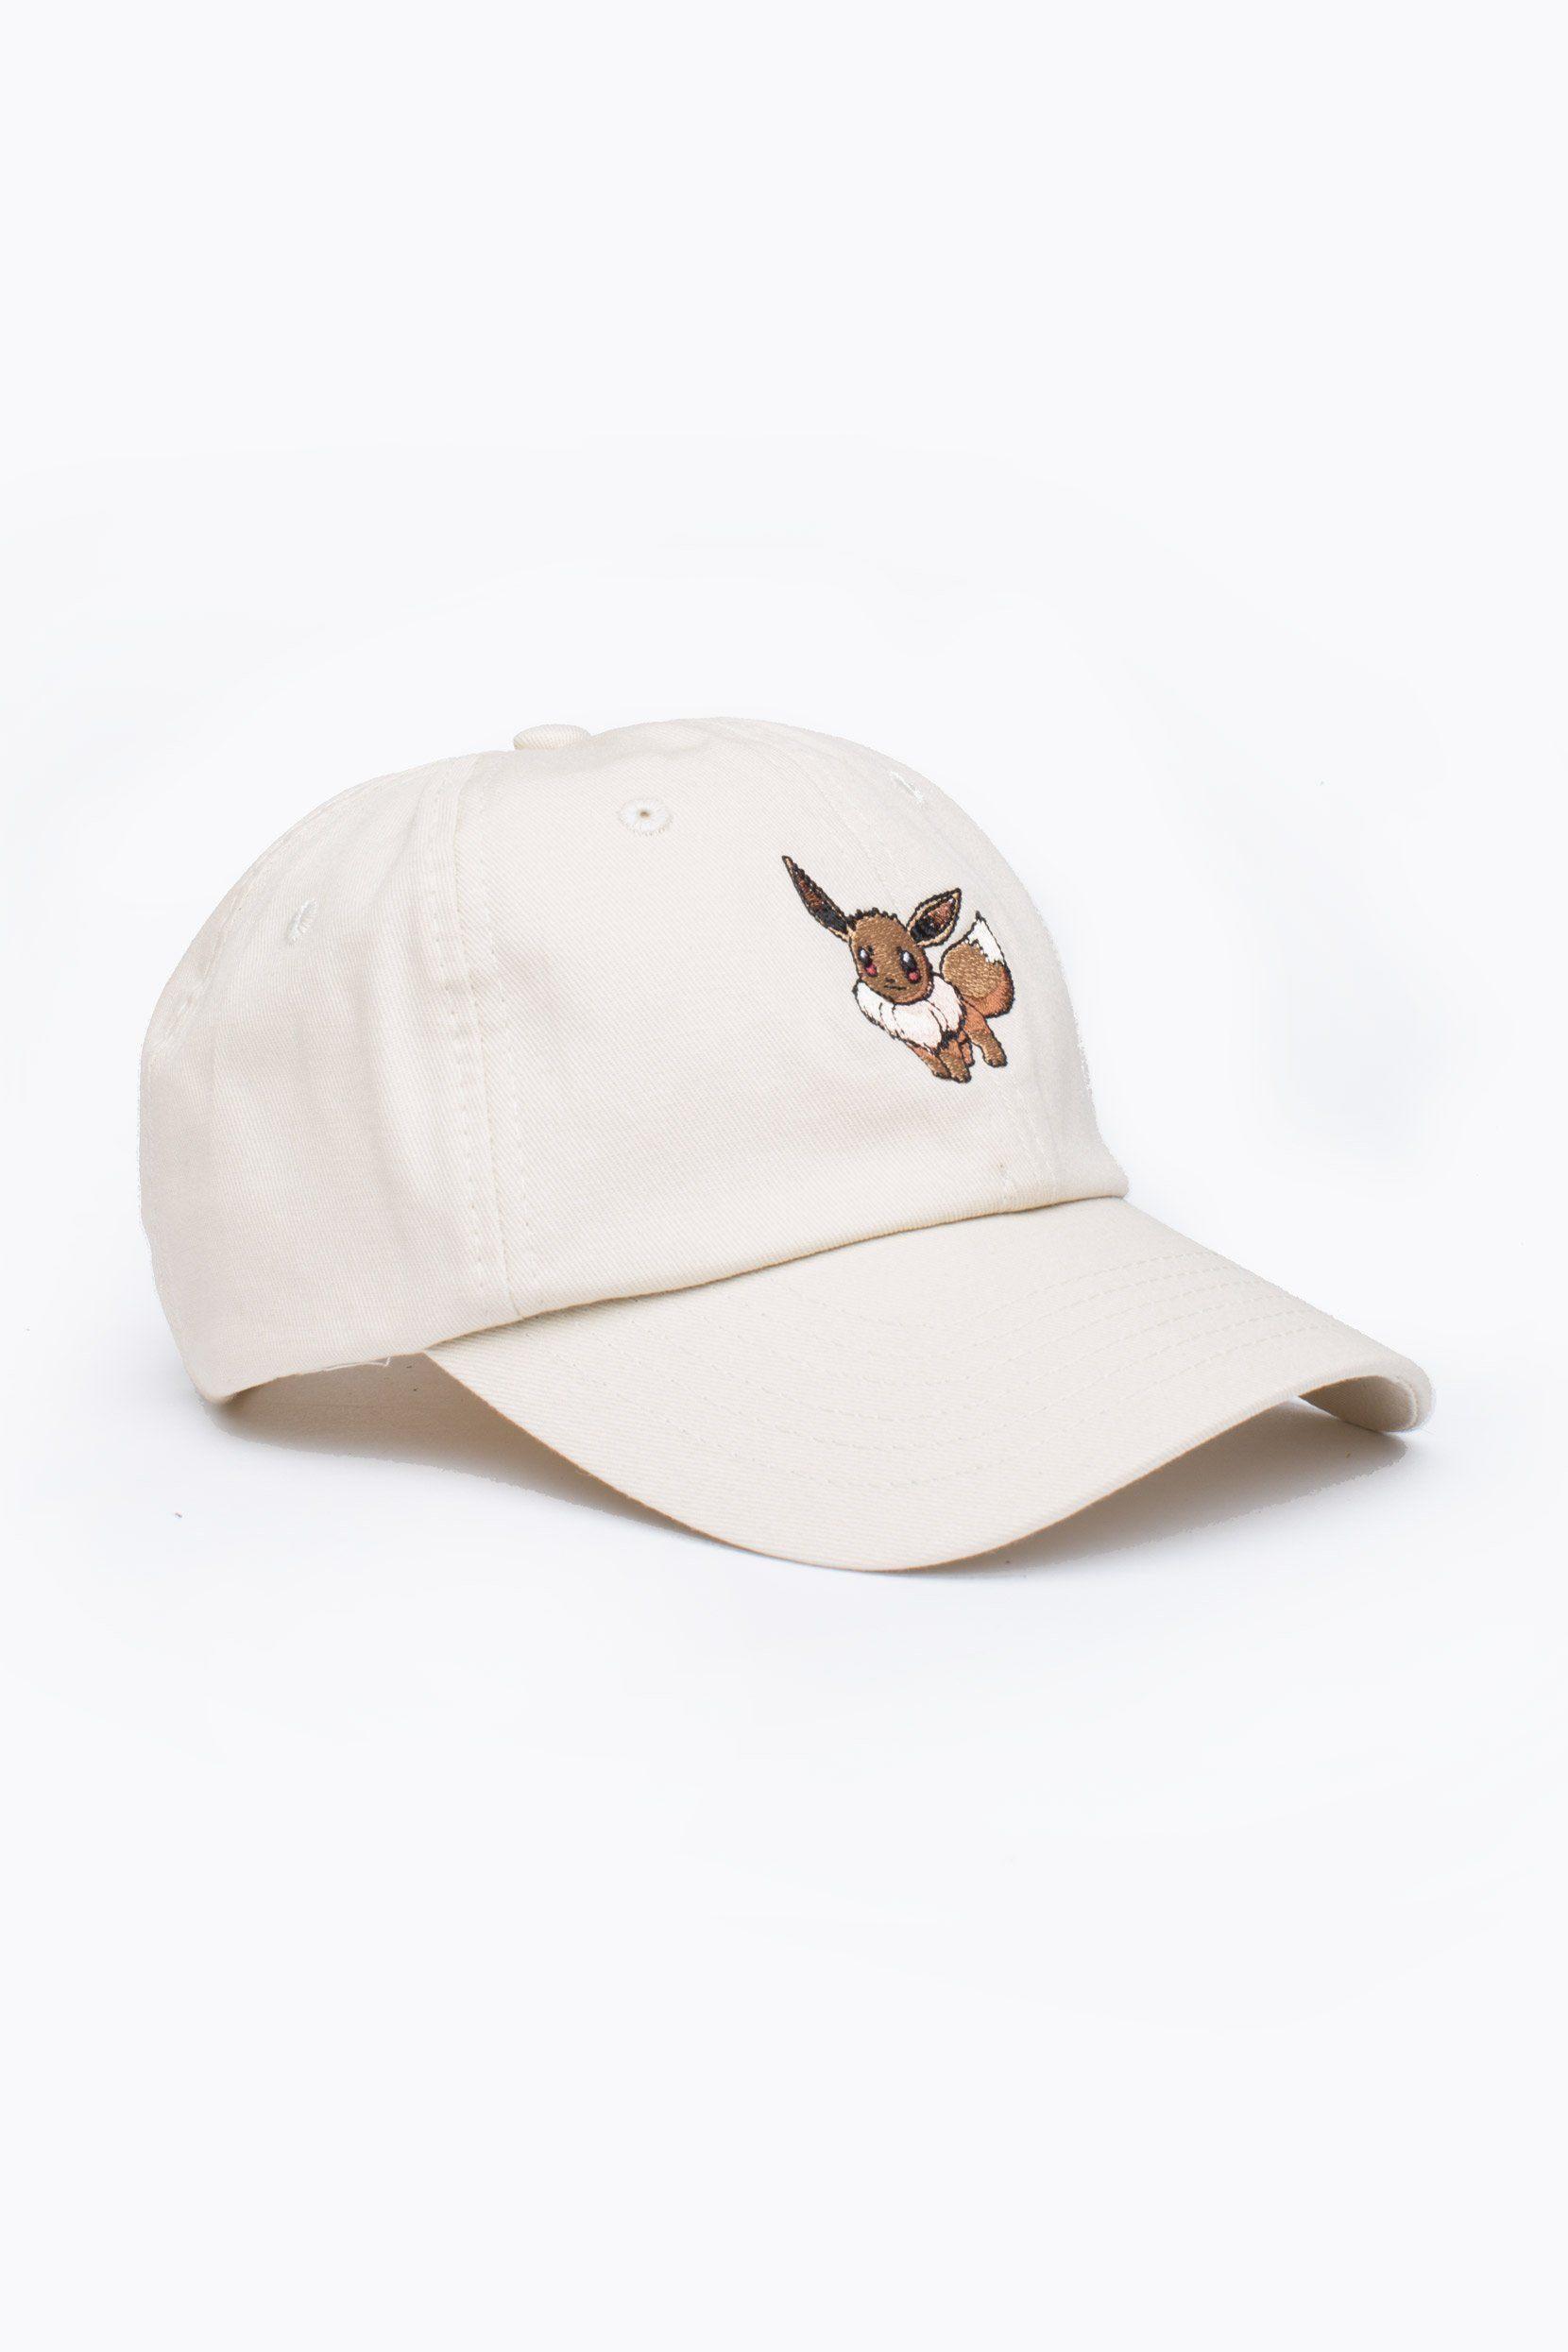 HYPE X Pokemon Sand Eevee Dad Hat